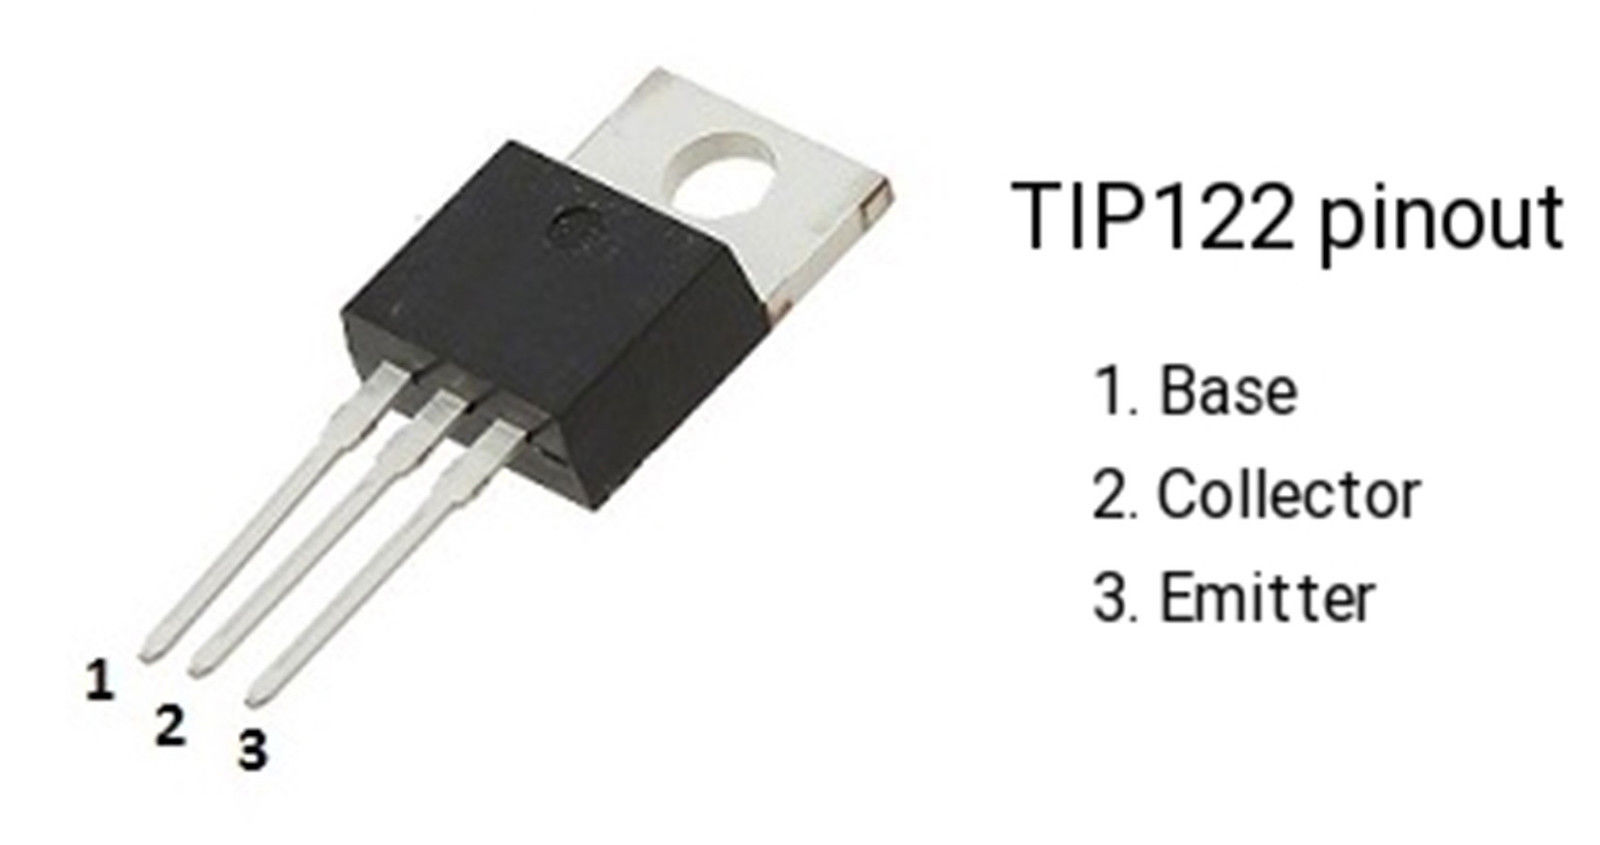 5 X Tip122 Npn Silicon Darlington Transistor To 220 All Top Notch Configuration